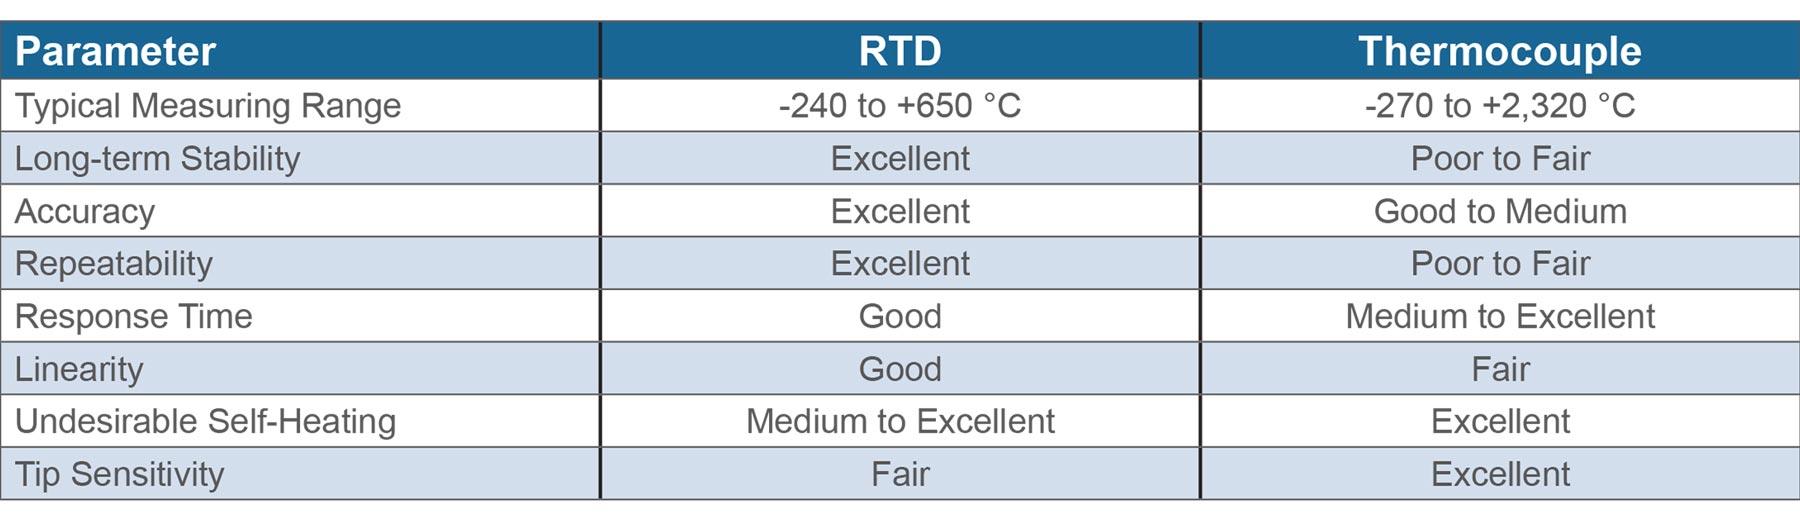 مقایسه سنسور ترموکوپل و RTD